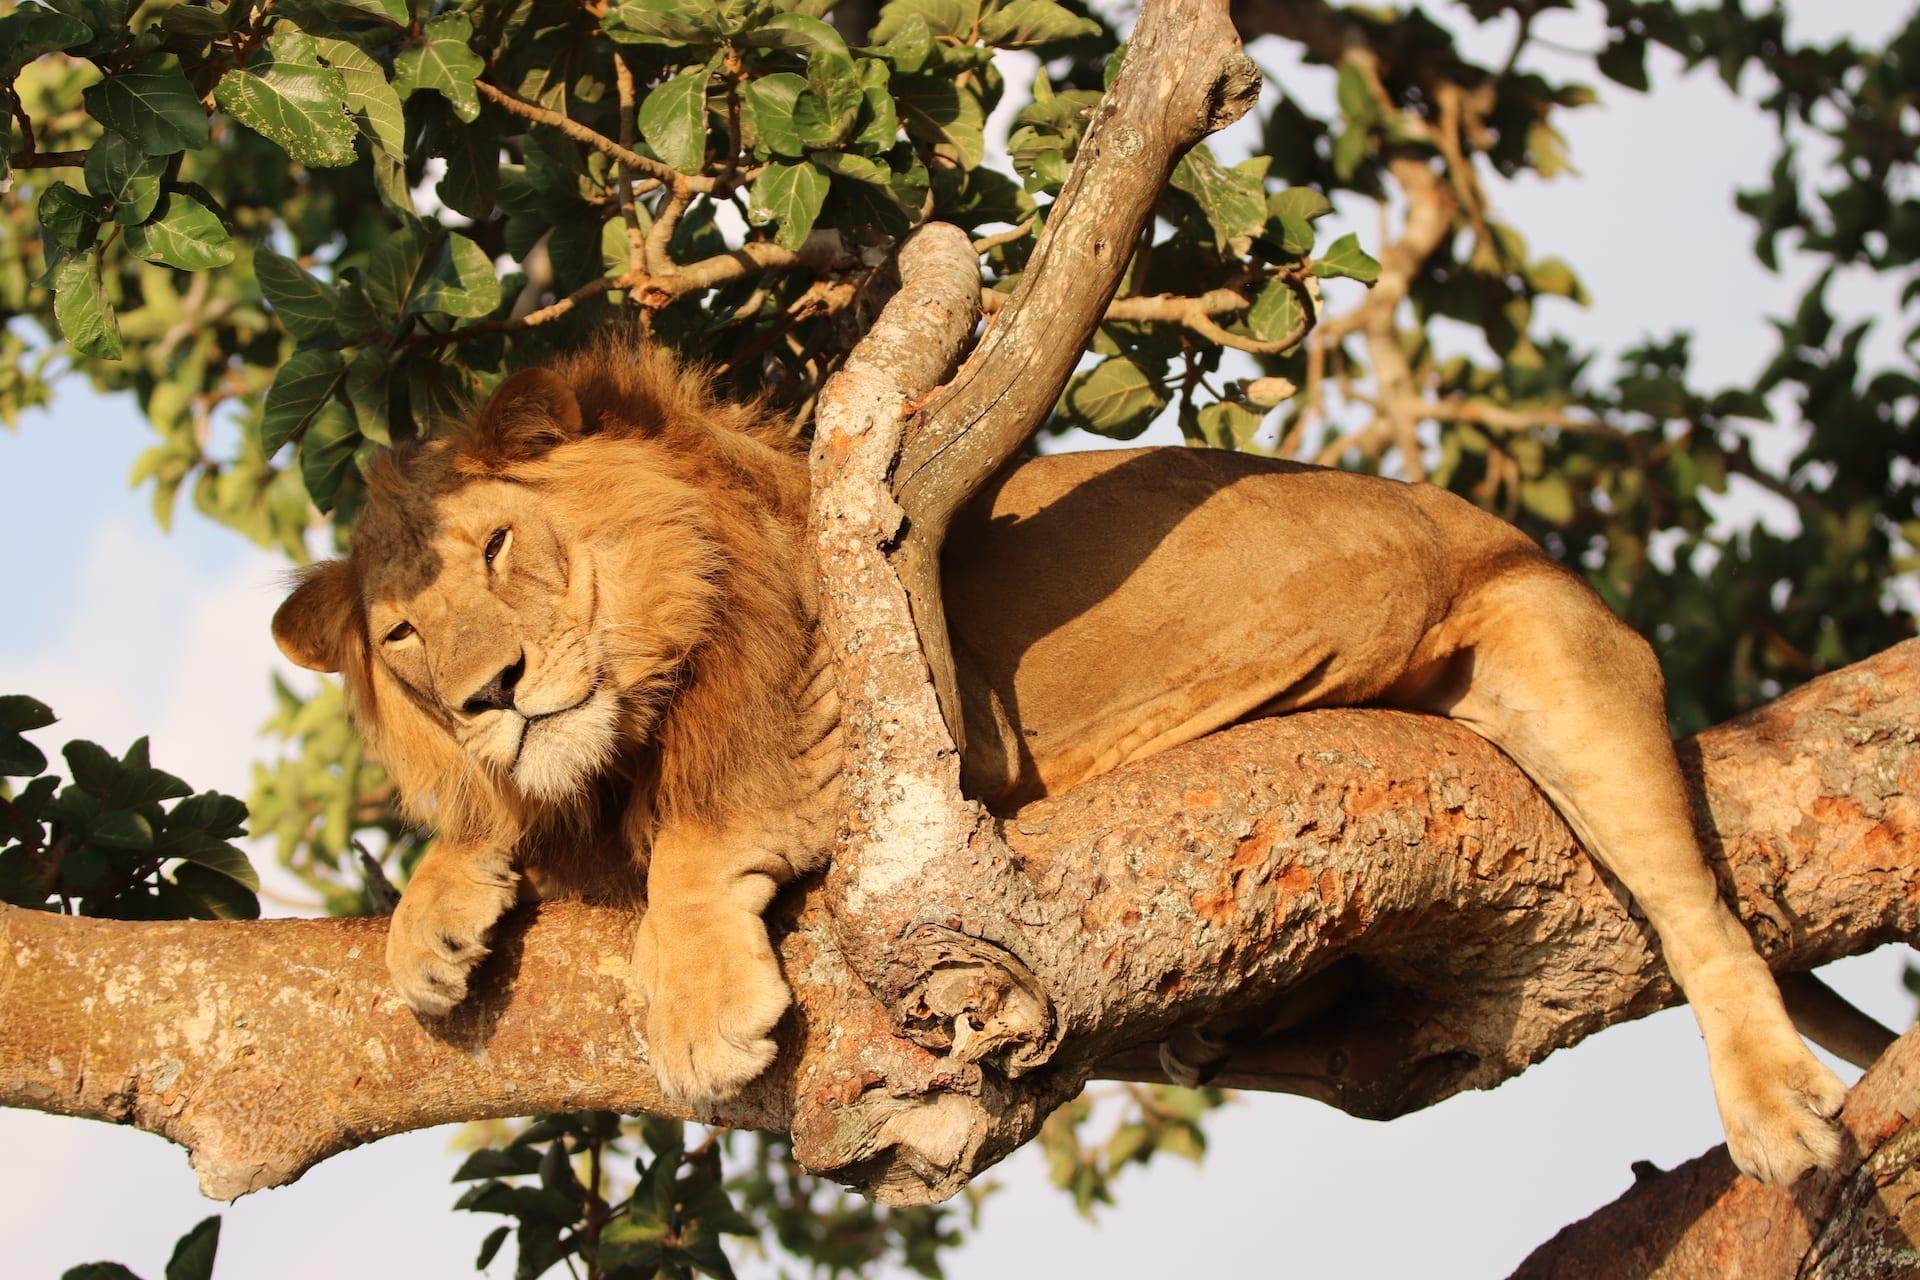 OVERIGE LANDEN - ALGEMEEN - OE - boomklimmende leeuwen - IMG_7122